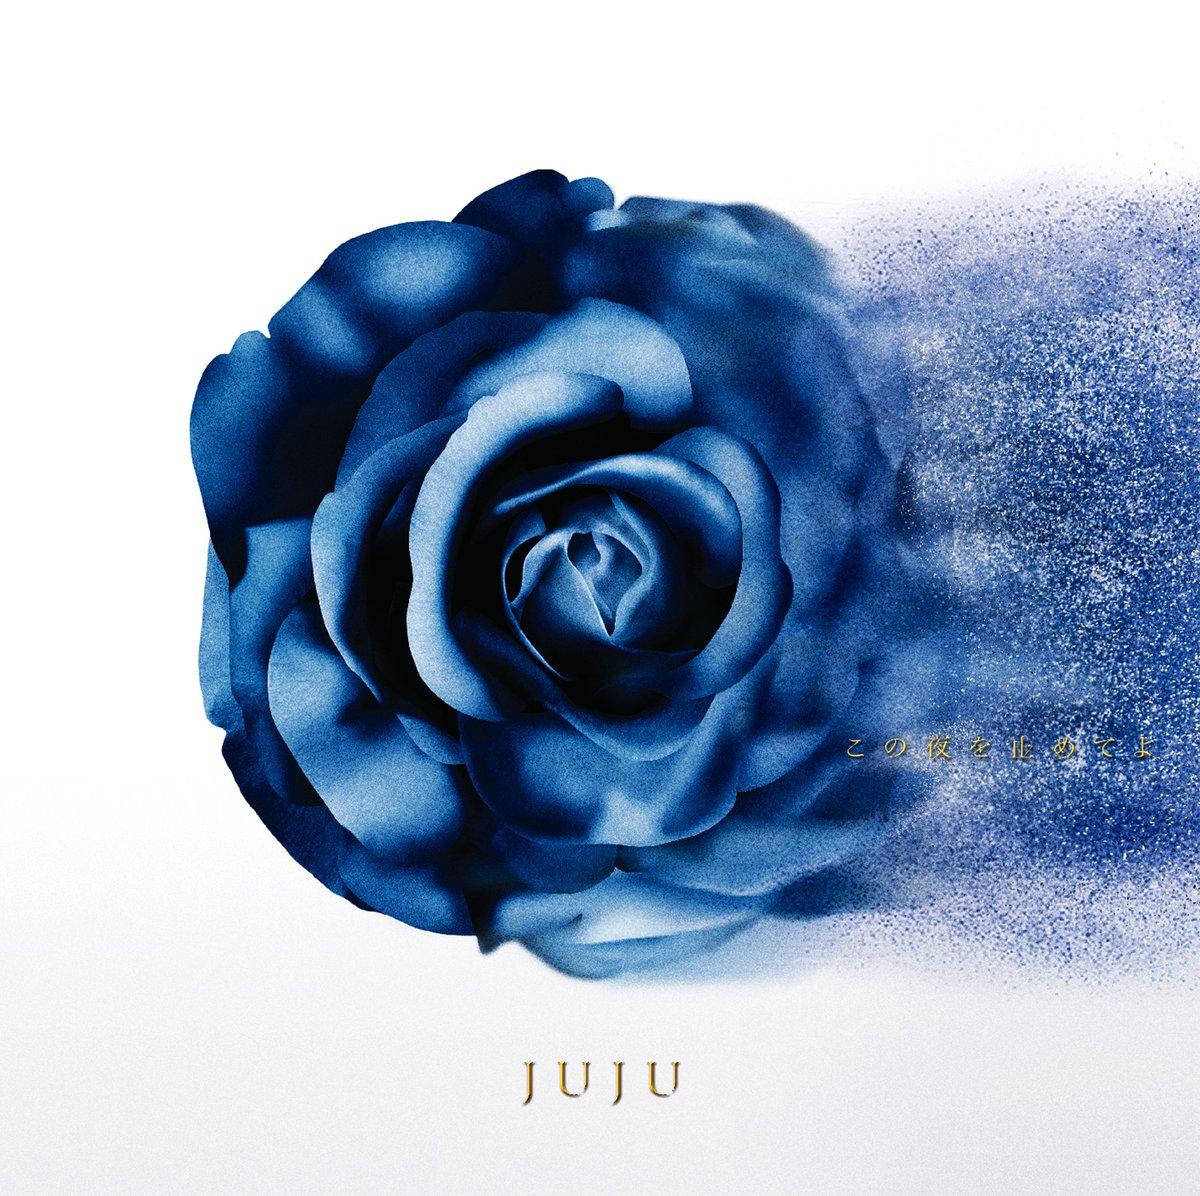 『JUJU - この夜を止めてよ 歌詞』収録の『この夜を止めてよ』ジャケット